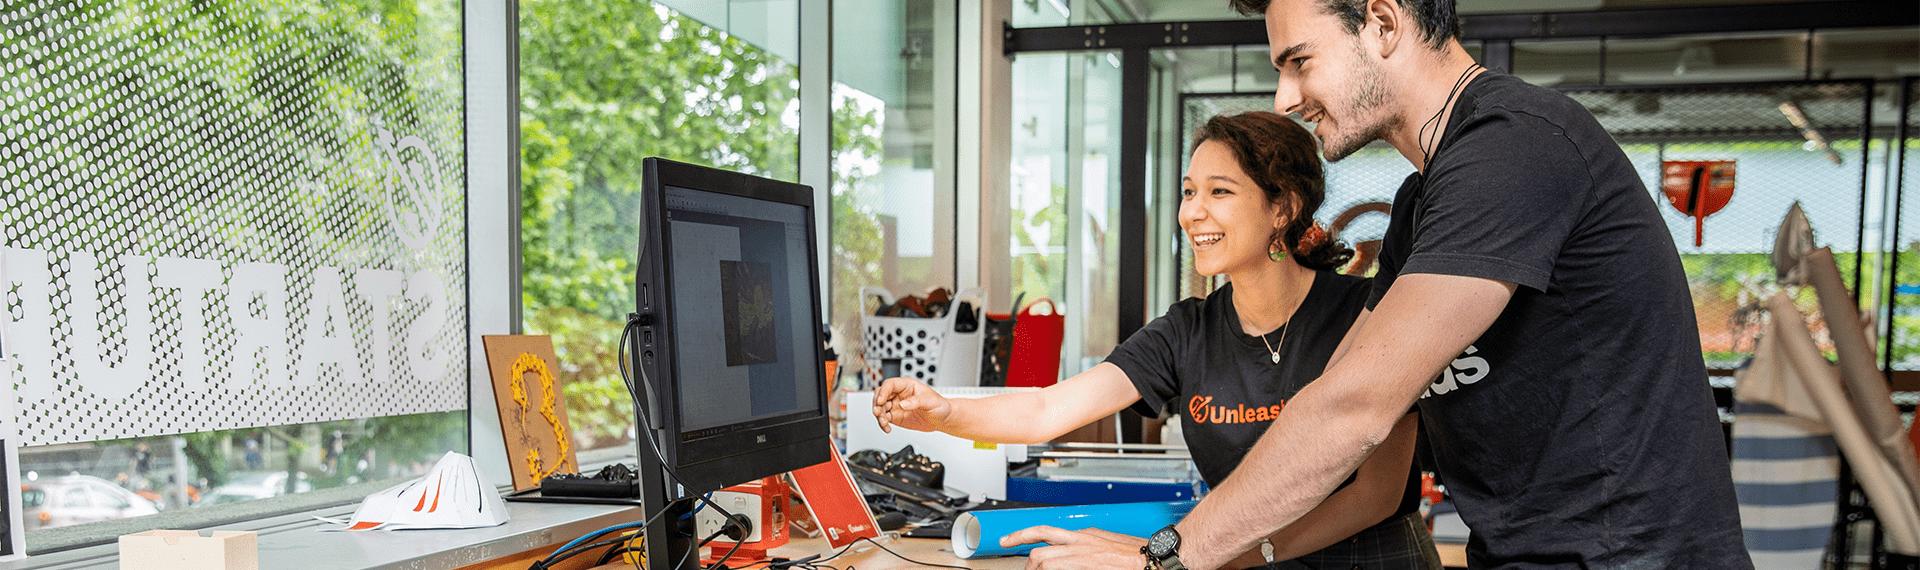 VentureLab Volunteer Opportunity